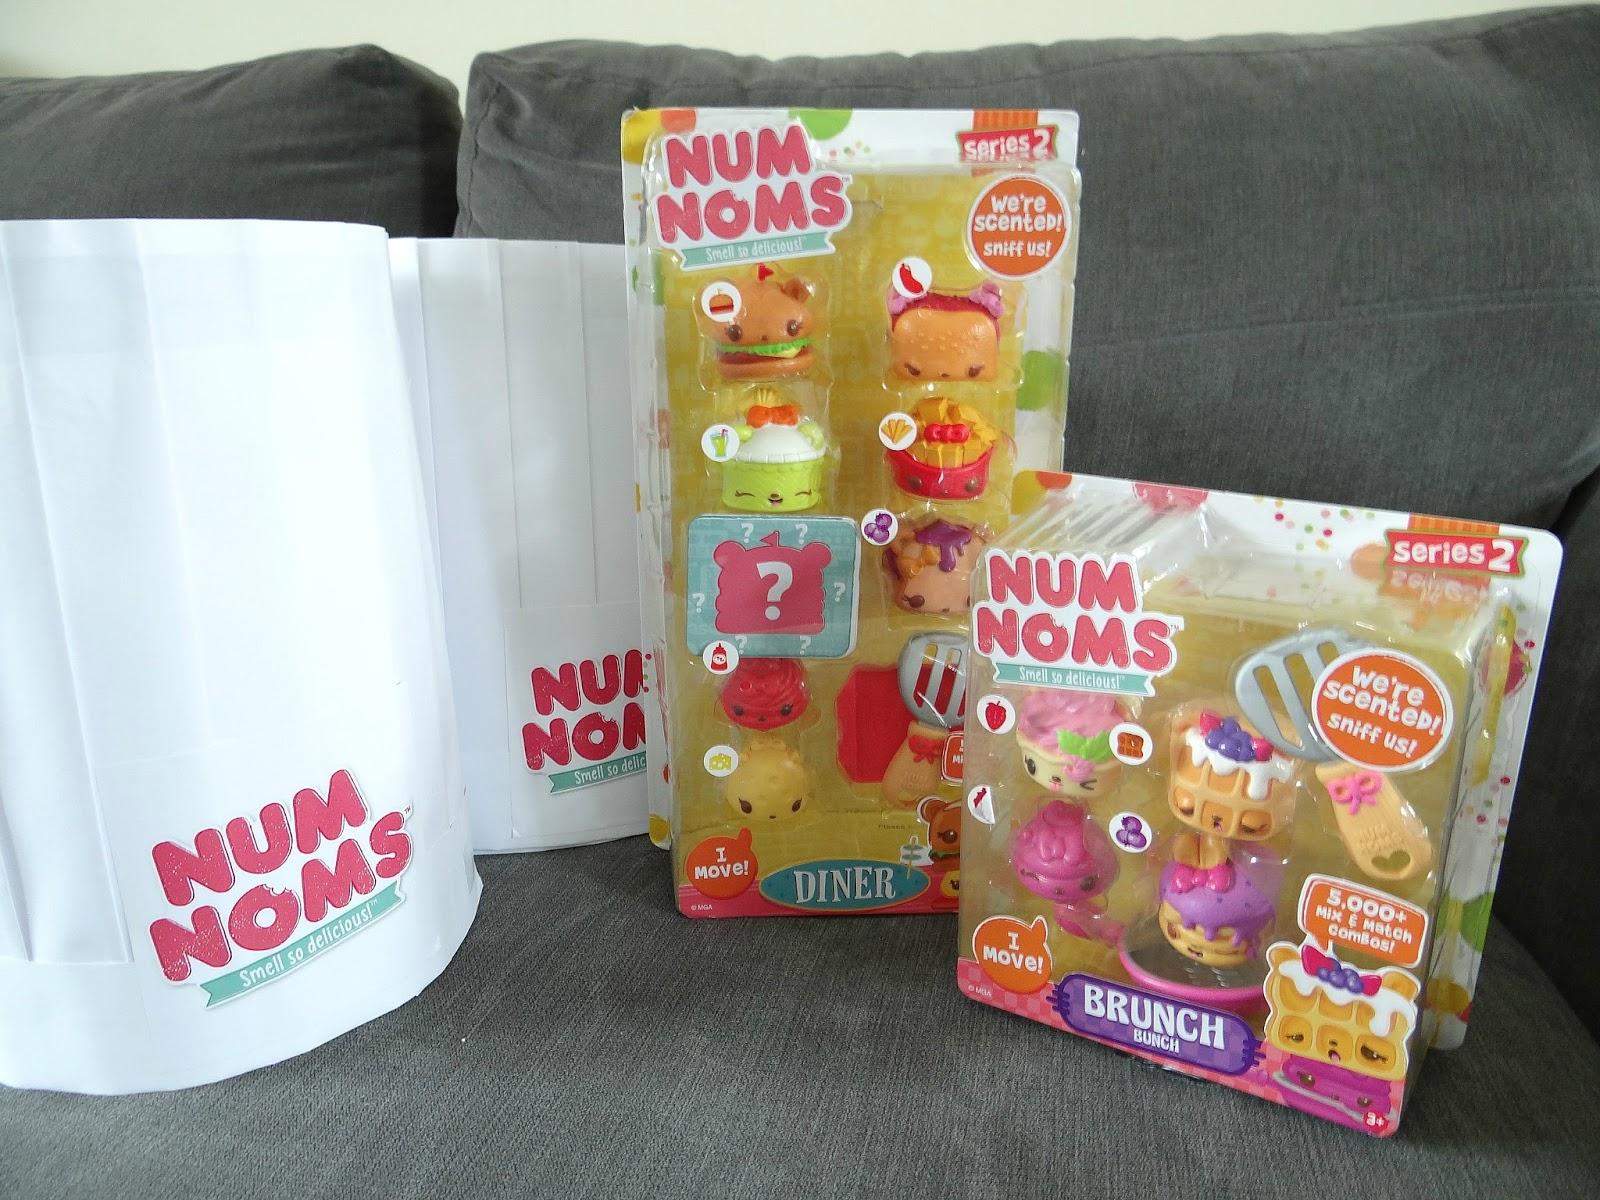 Num Noms Series 2, food toys, recipes